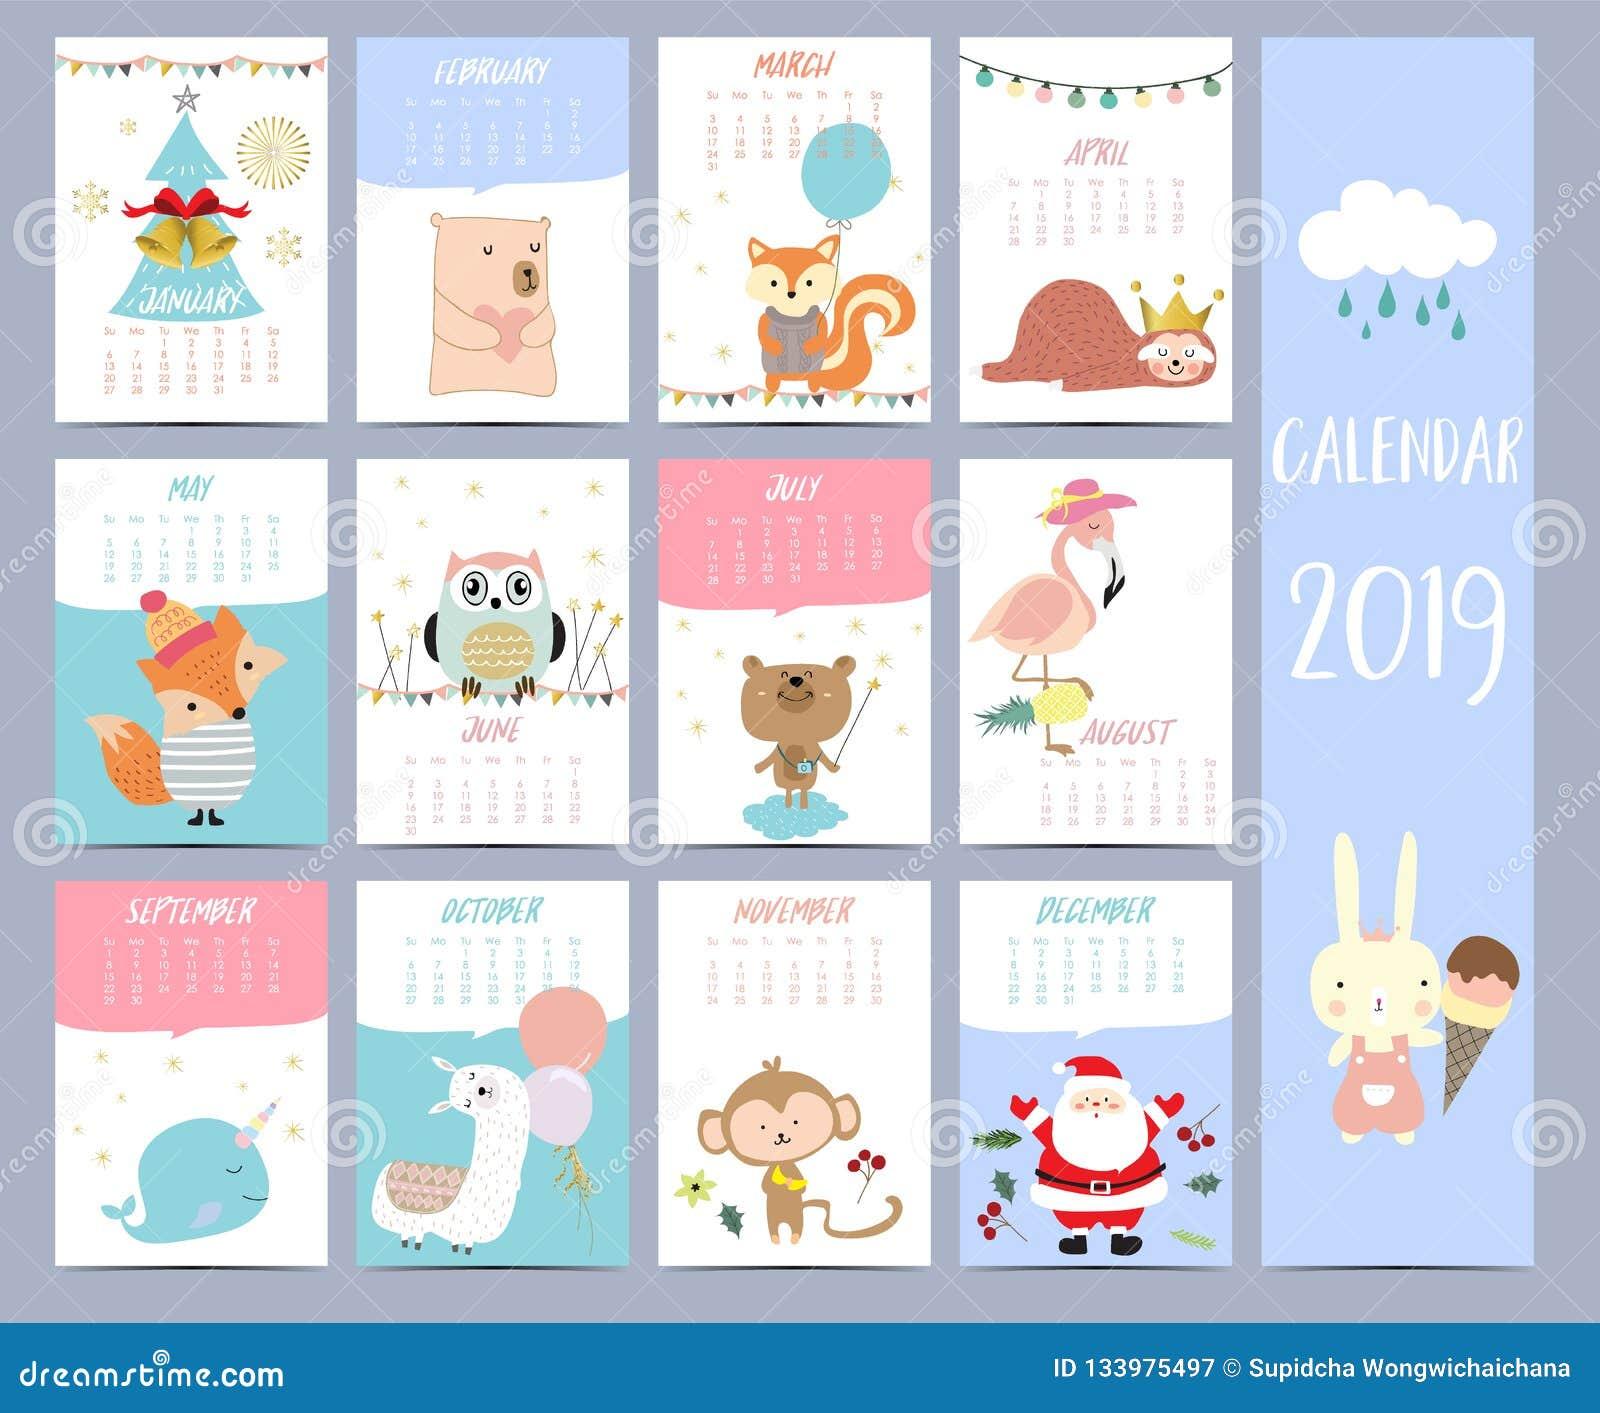 Doodle calendar set 2019 with Santa Claus;christmas tree, bear